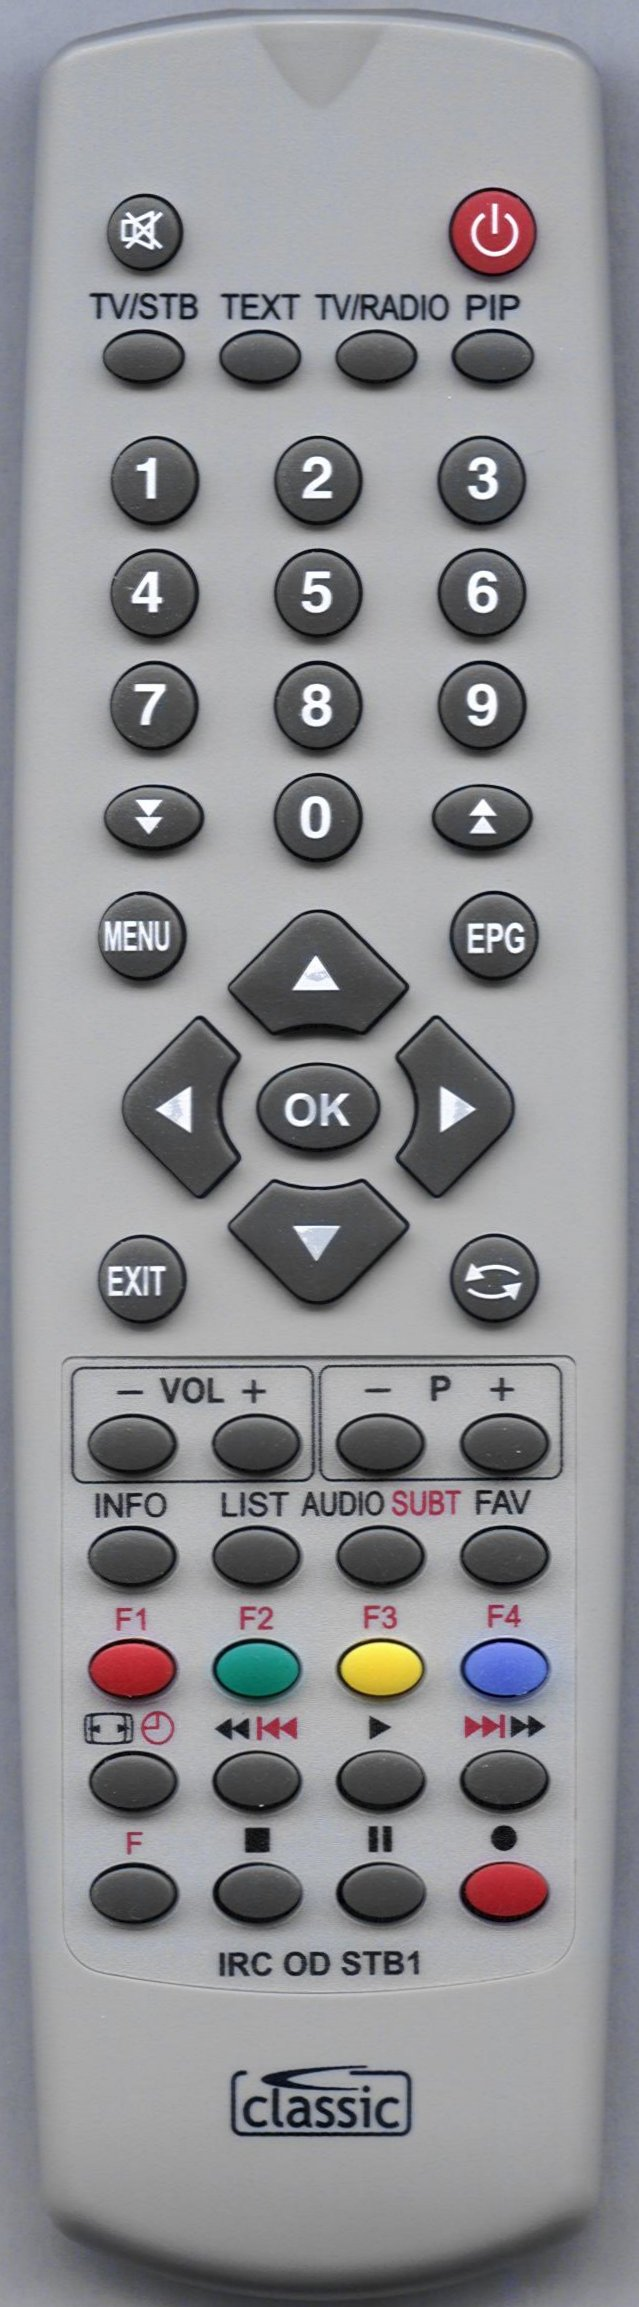 Topfield TF 7700HDPVR Remote Control